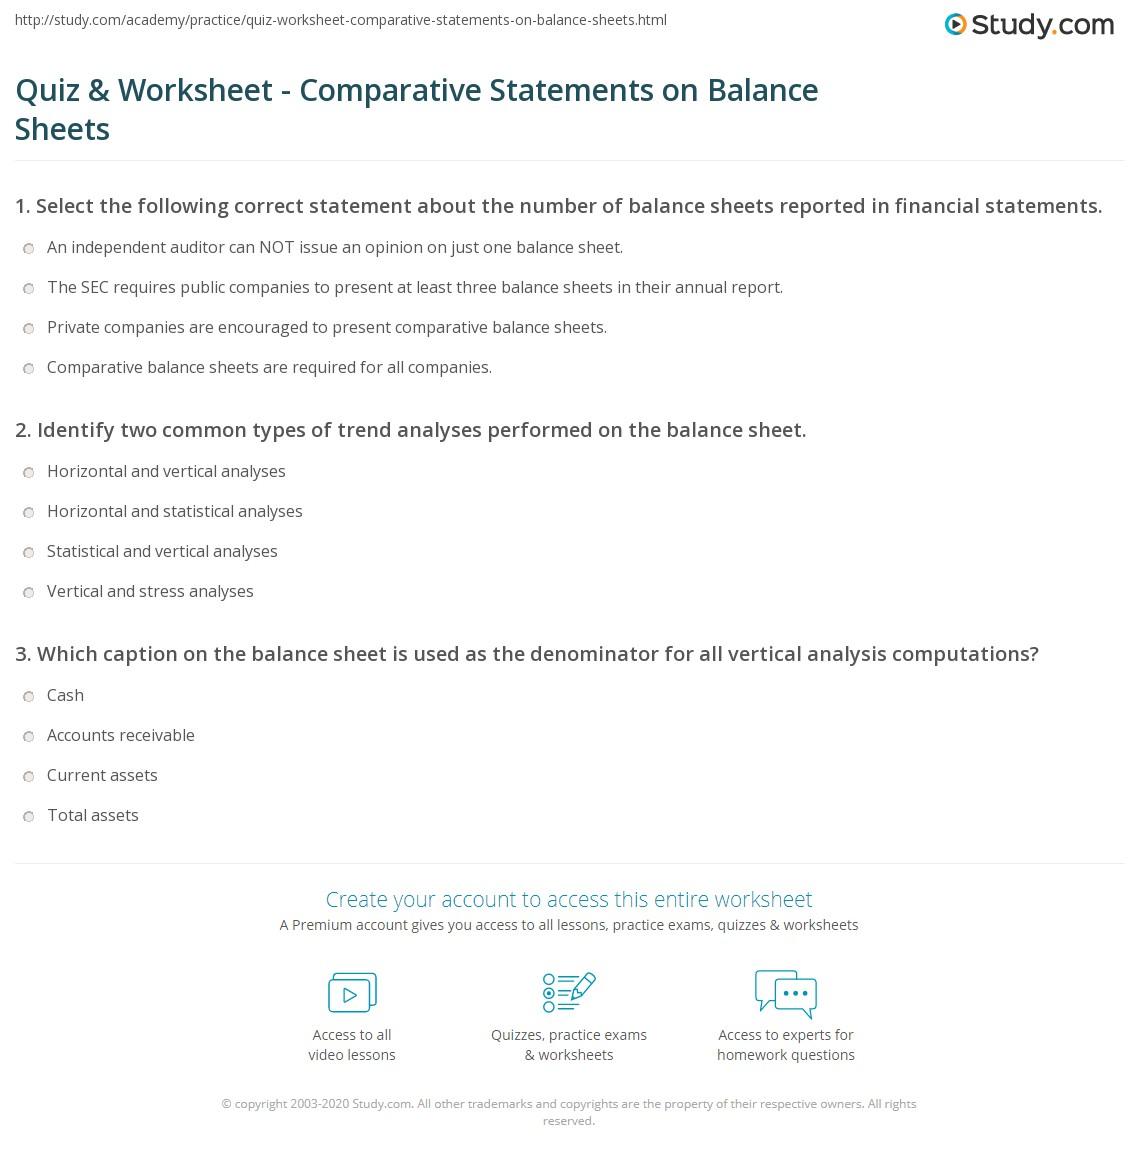 Quiz Worksheet Comparative Statements On Balance Sheets Study Com